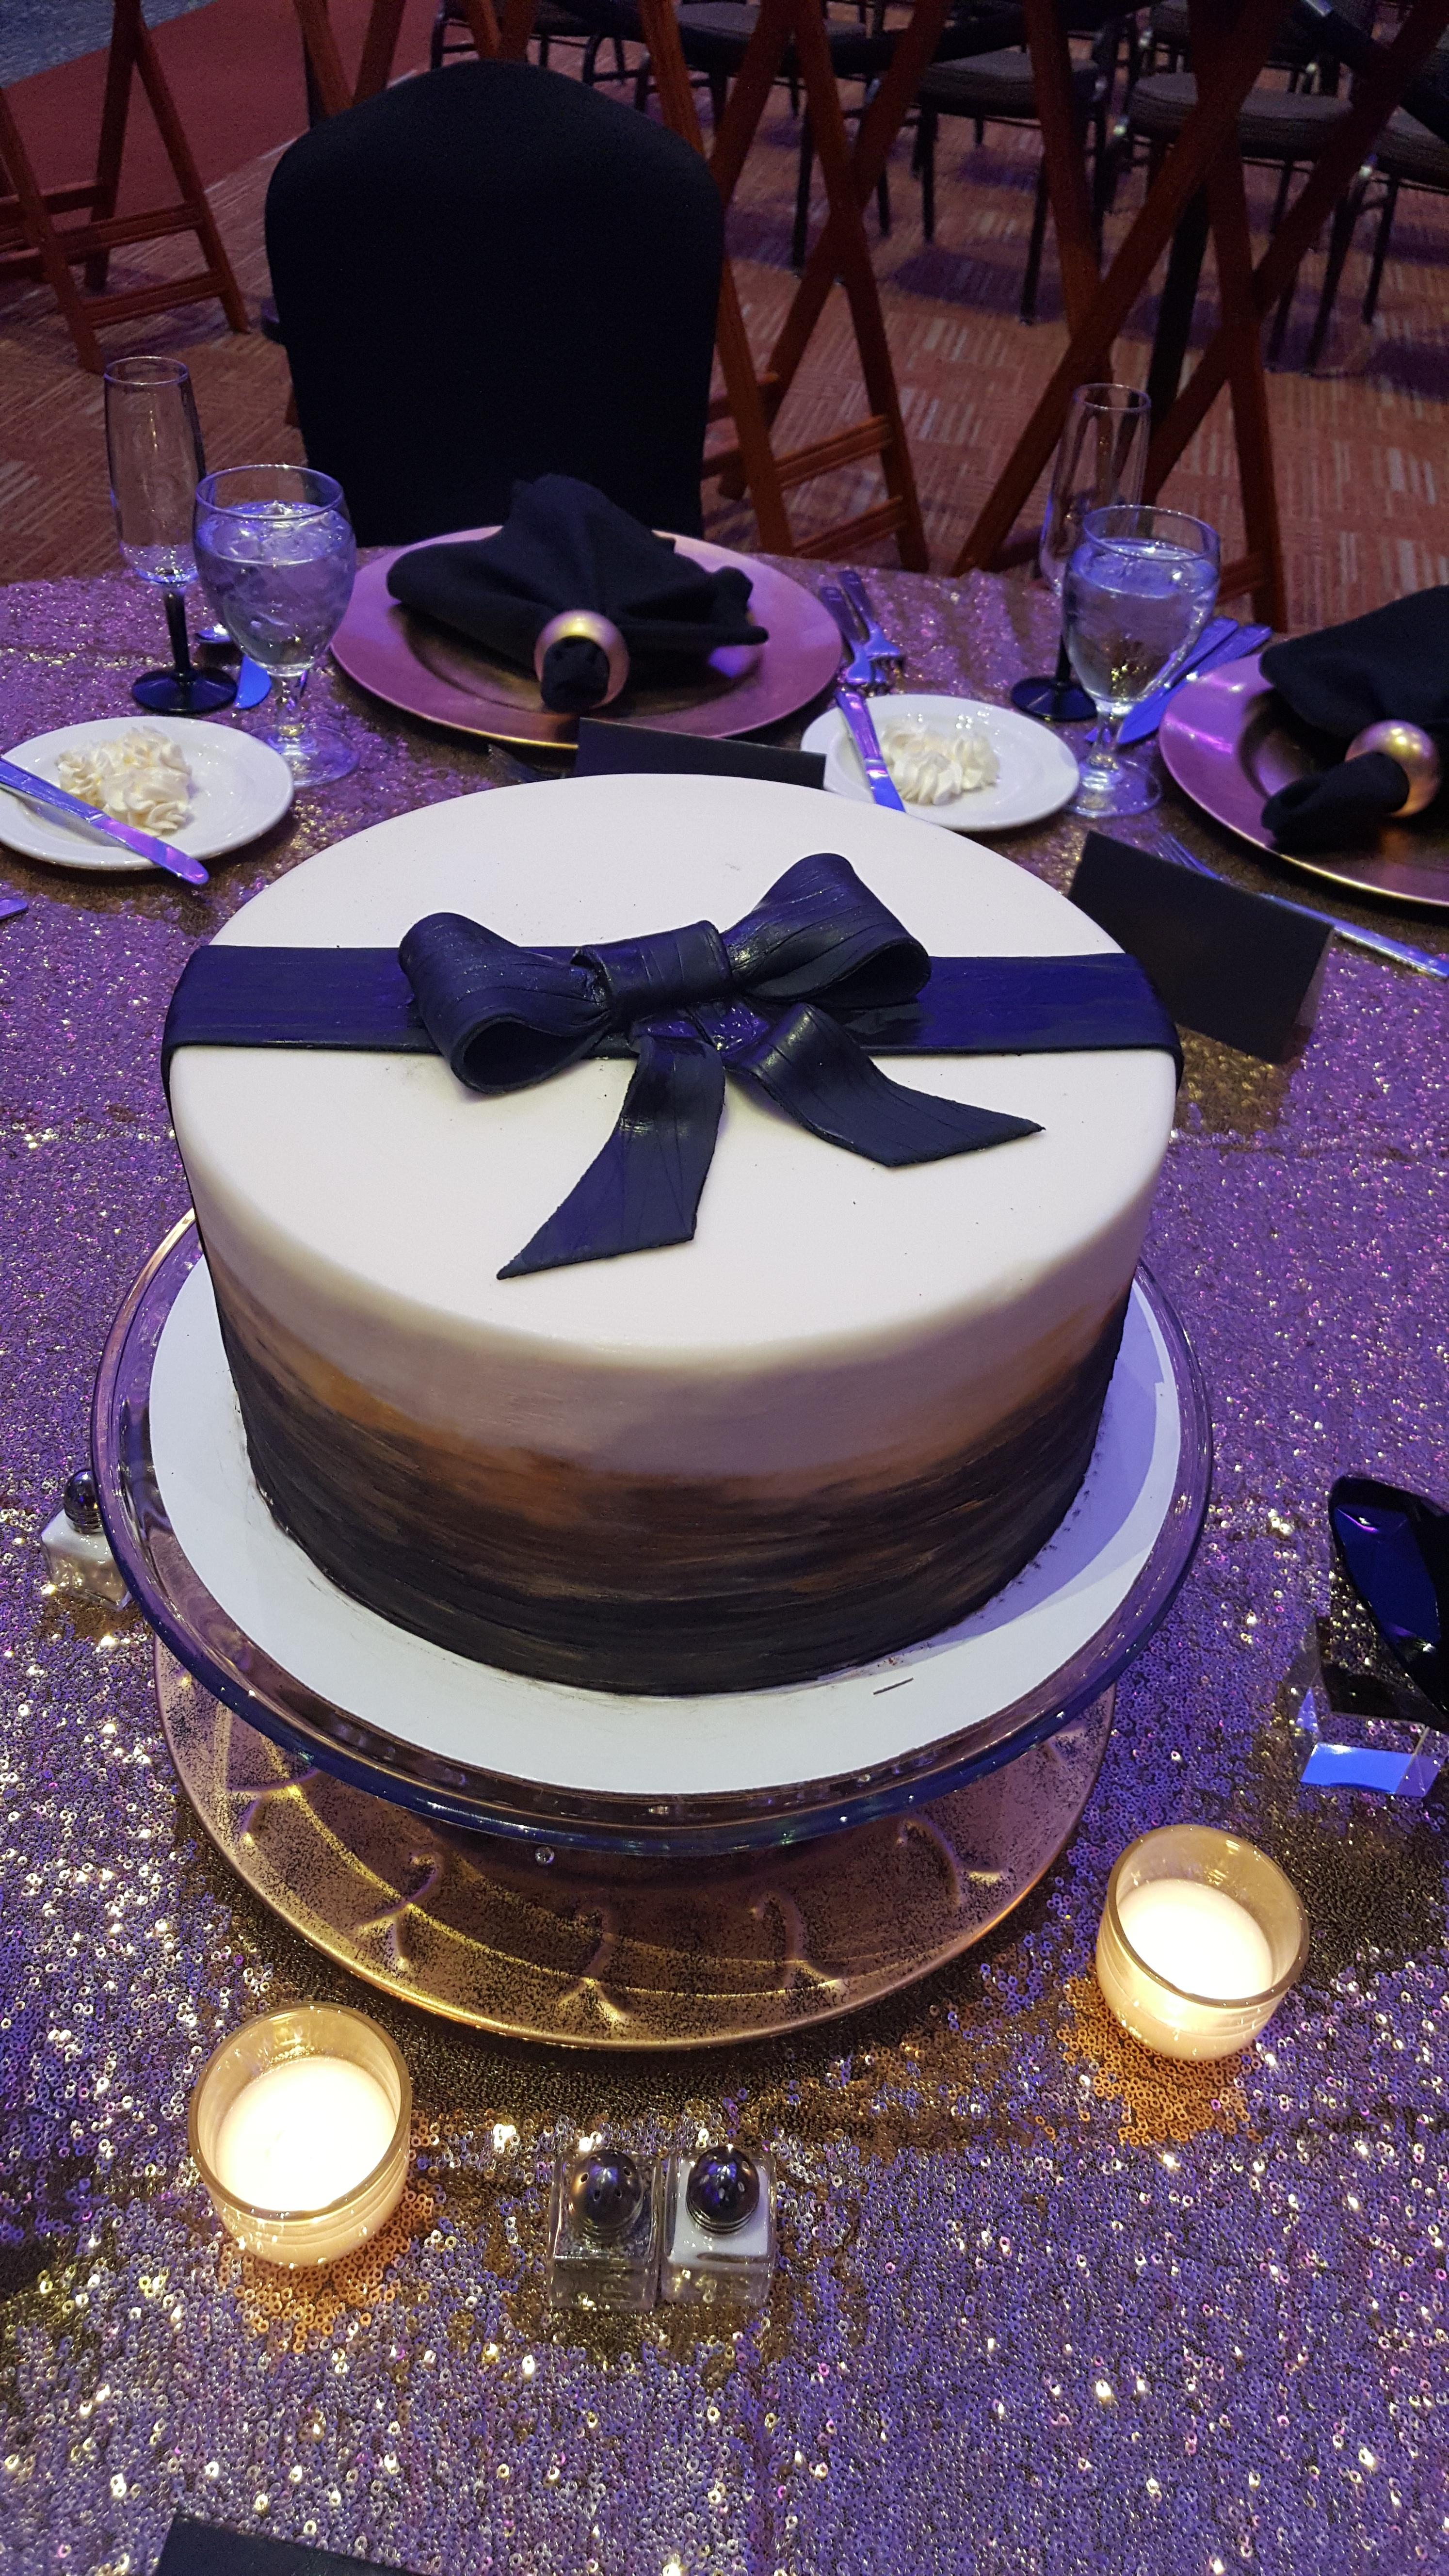 prpura comida postre pastel pastel de cumpleaos formacin de hielo pastel de boda torta crema de